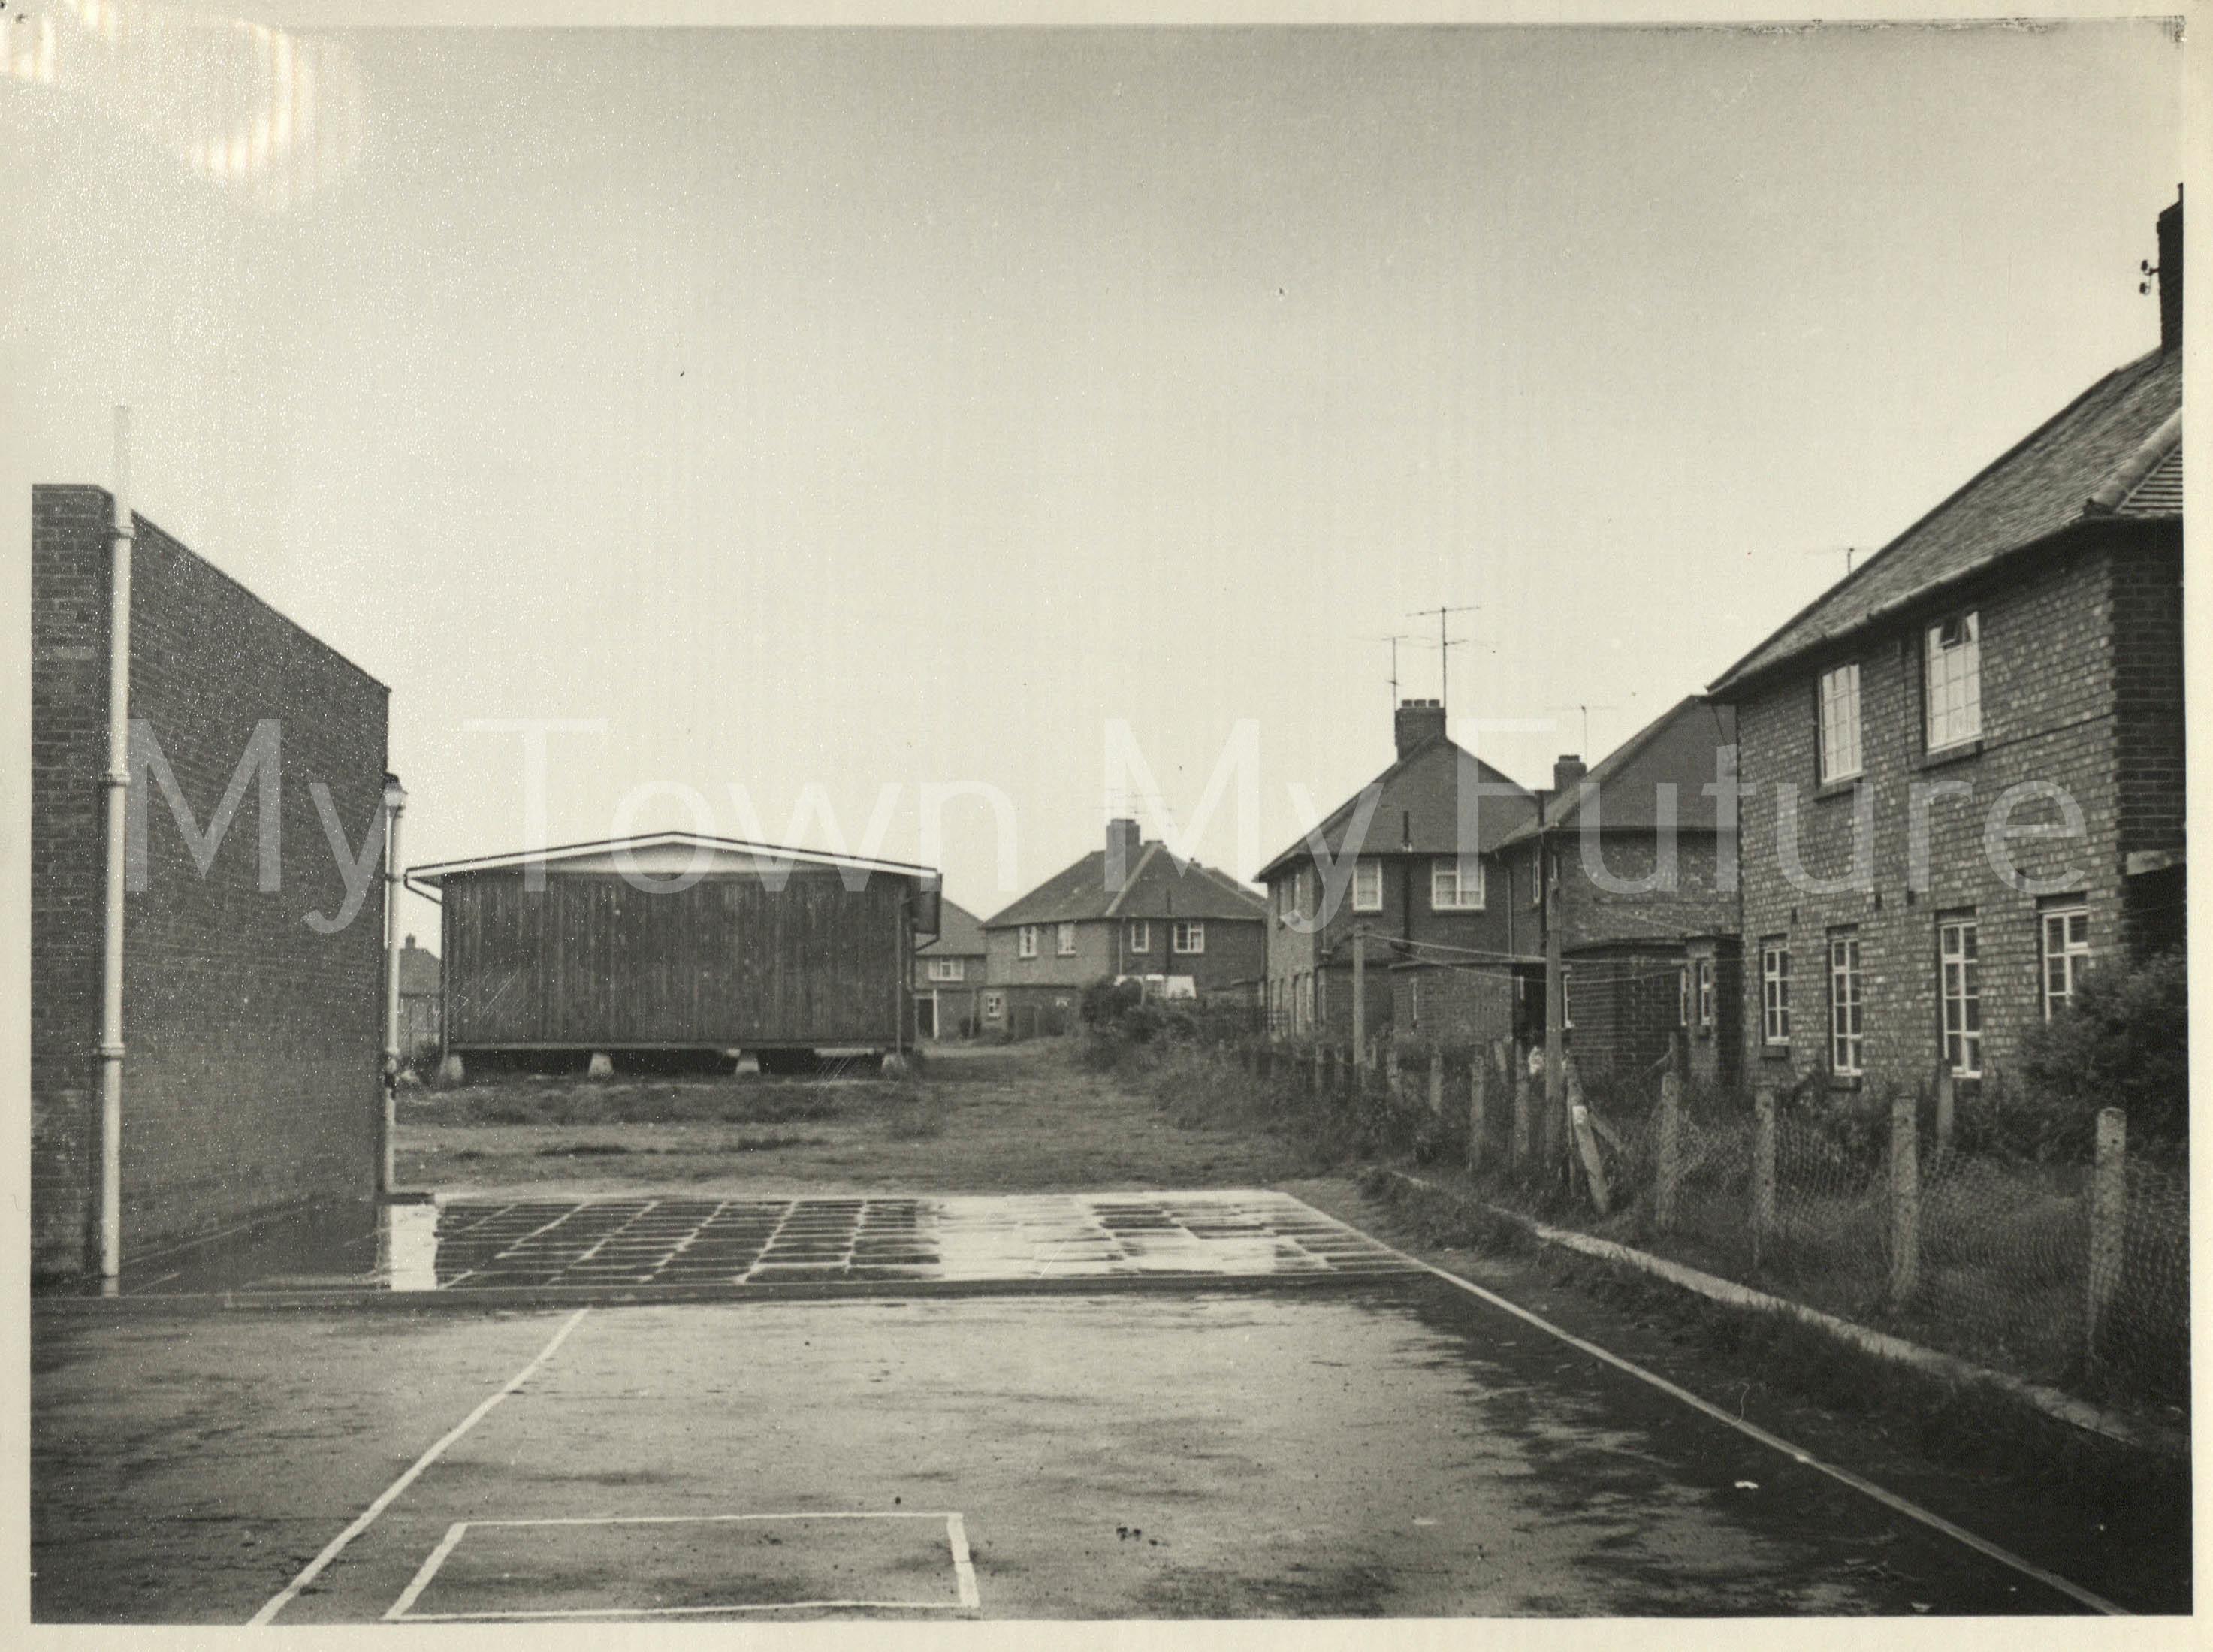 Berwick Hills Primary School